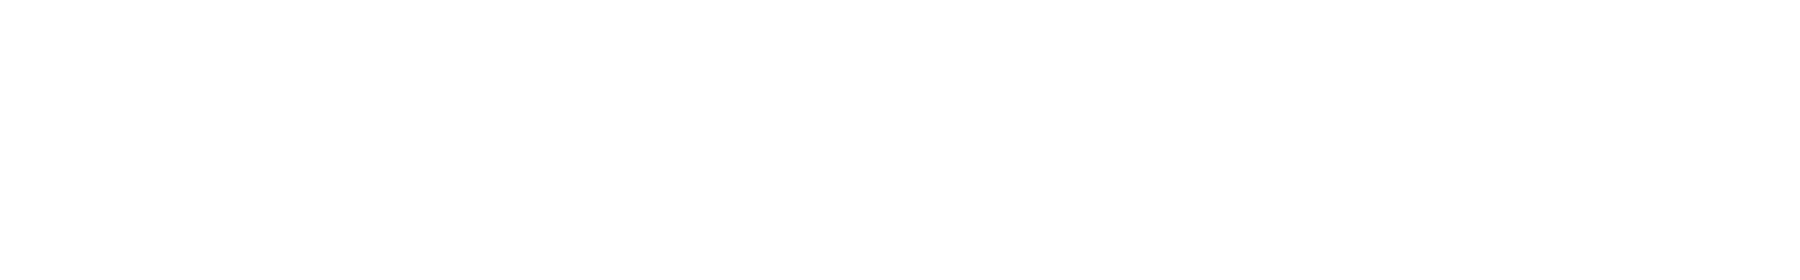 organ dm